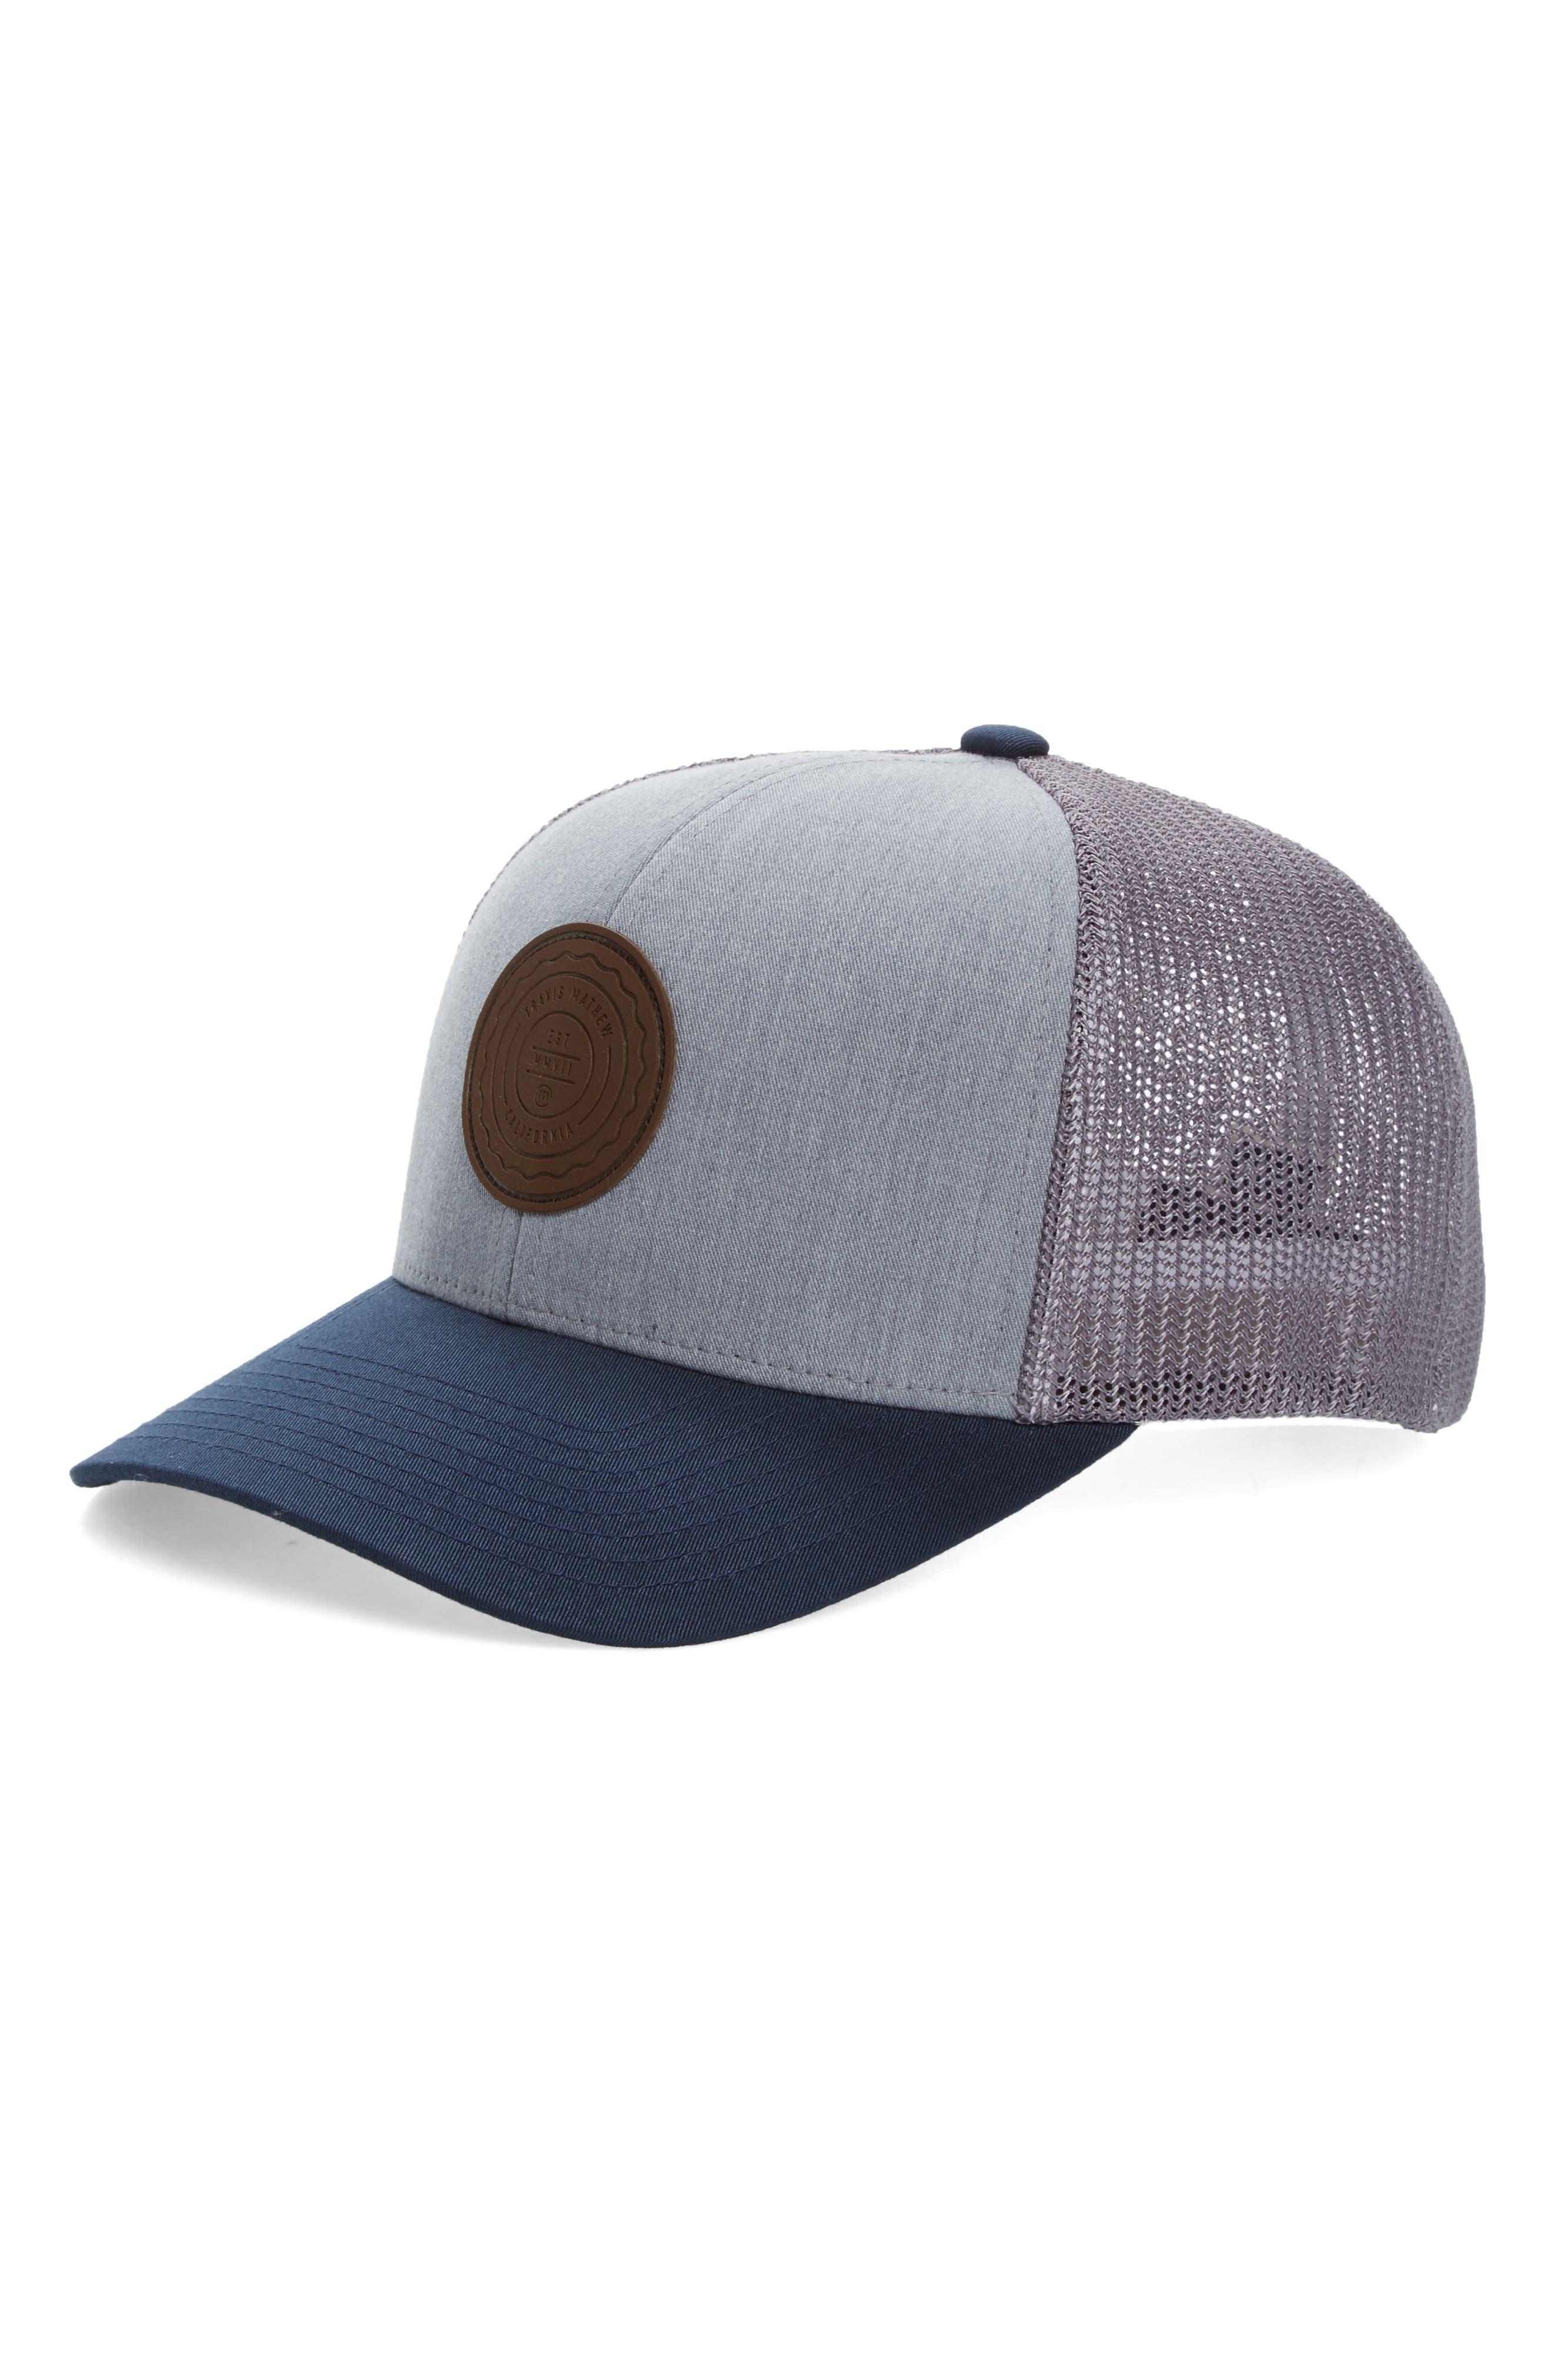 Murdock Trucker Cap,                         Main,                         color, 020